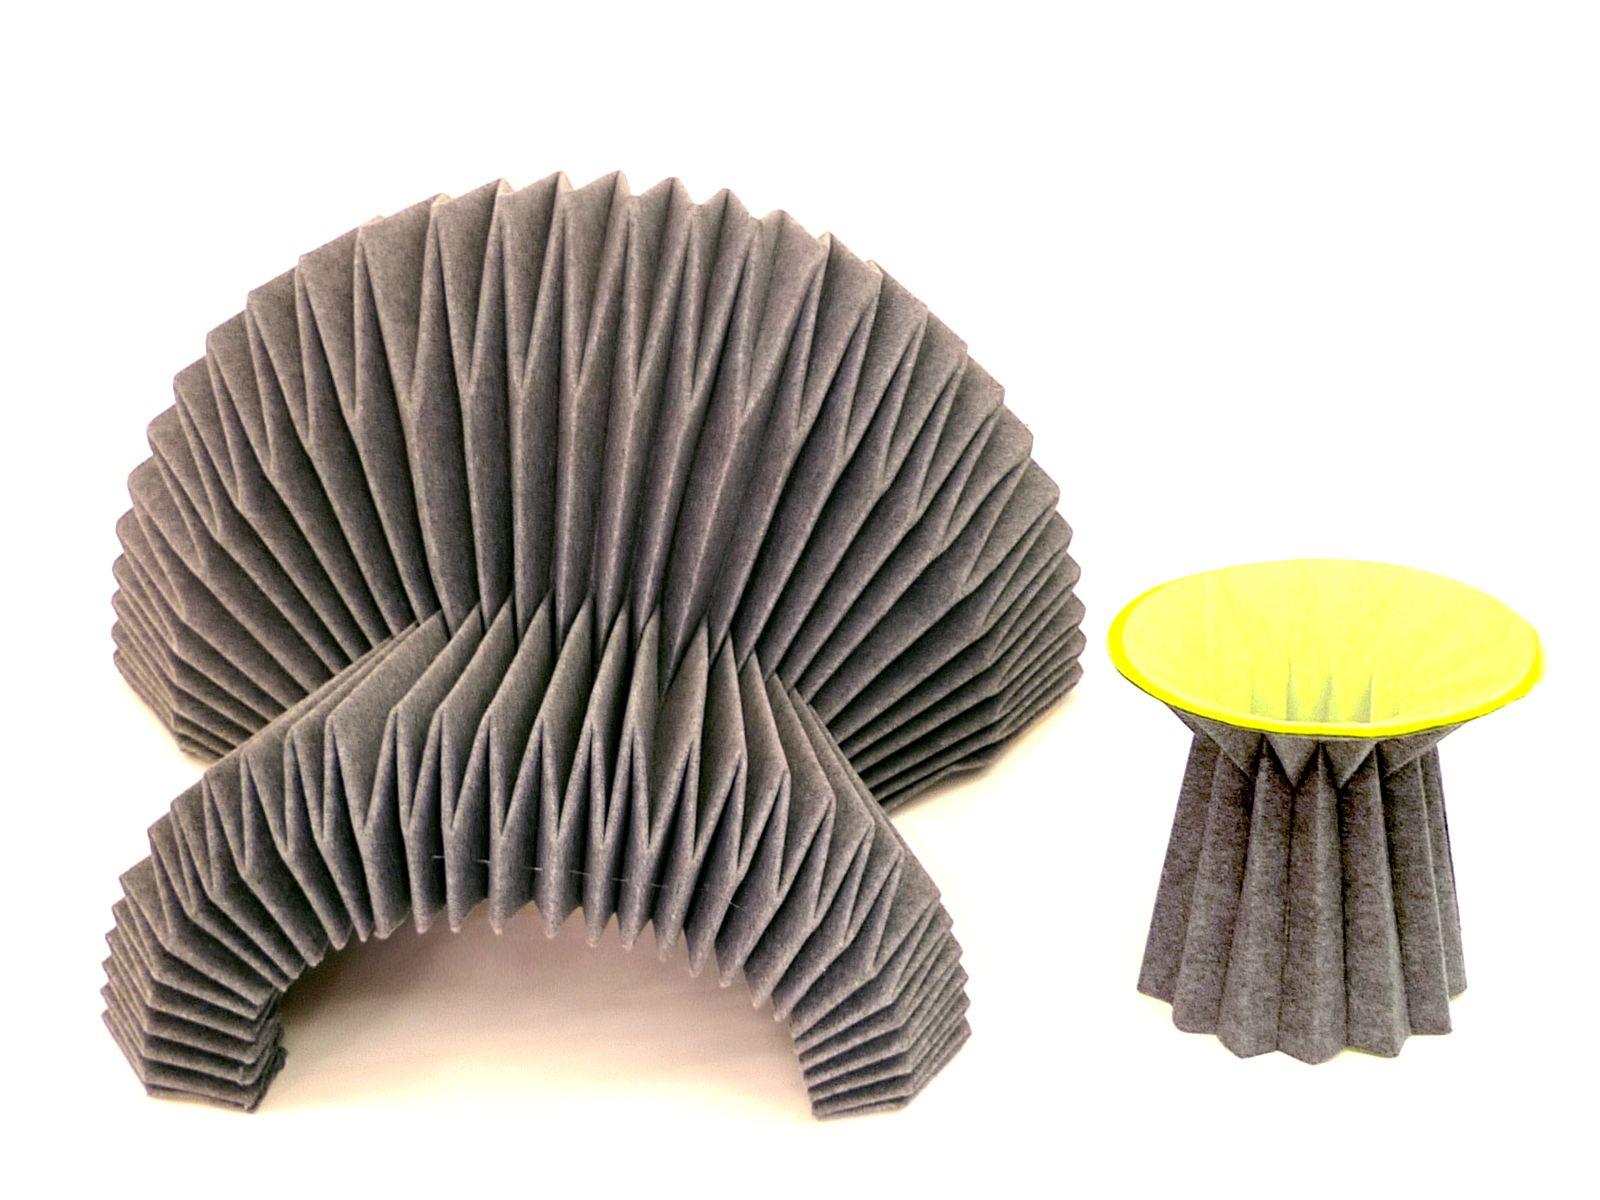 Li-Rong Liao. Folded Felt Table. | furniture - photo#45